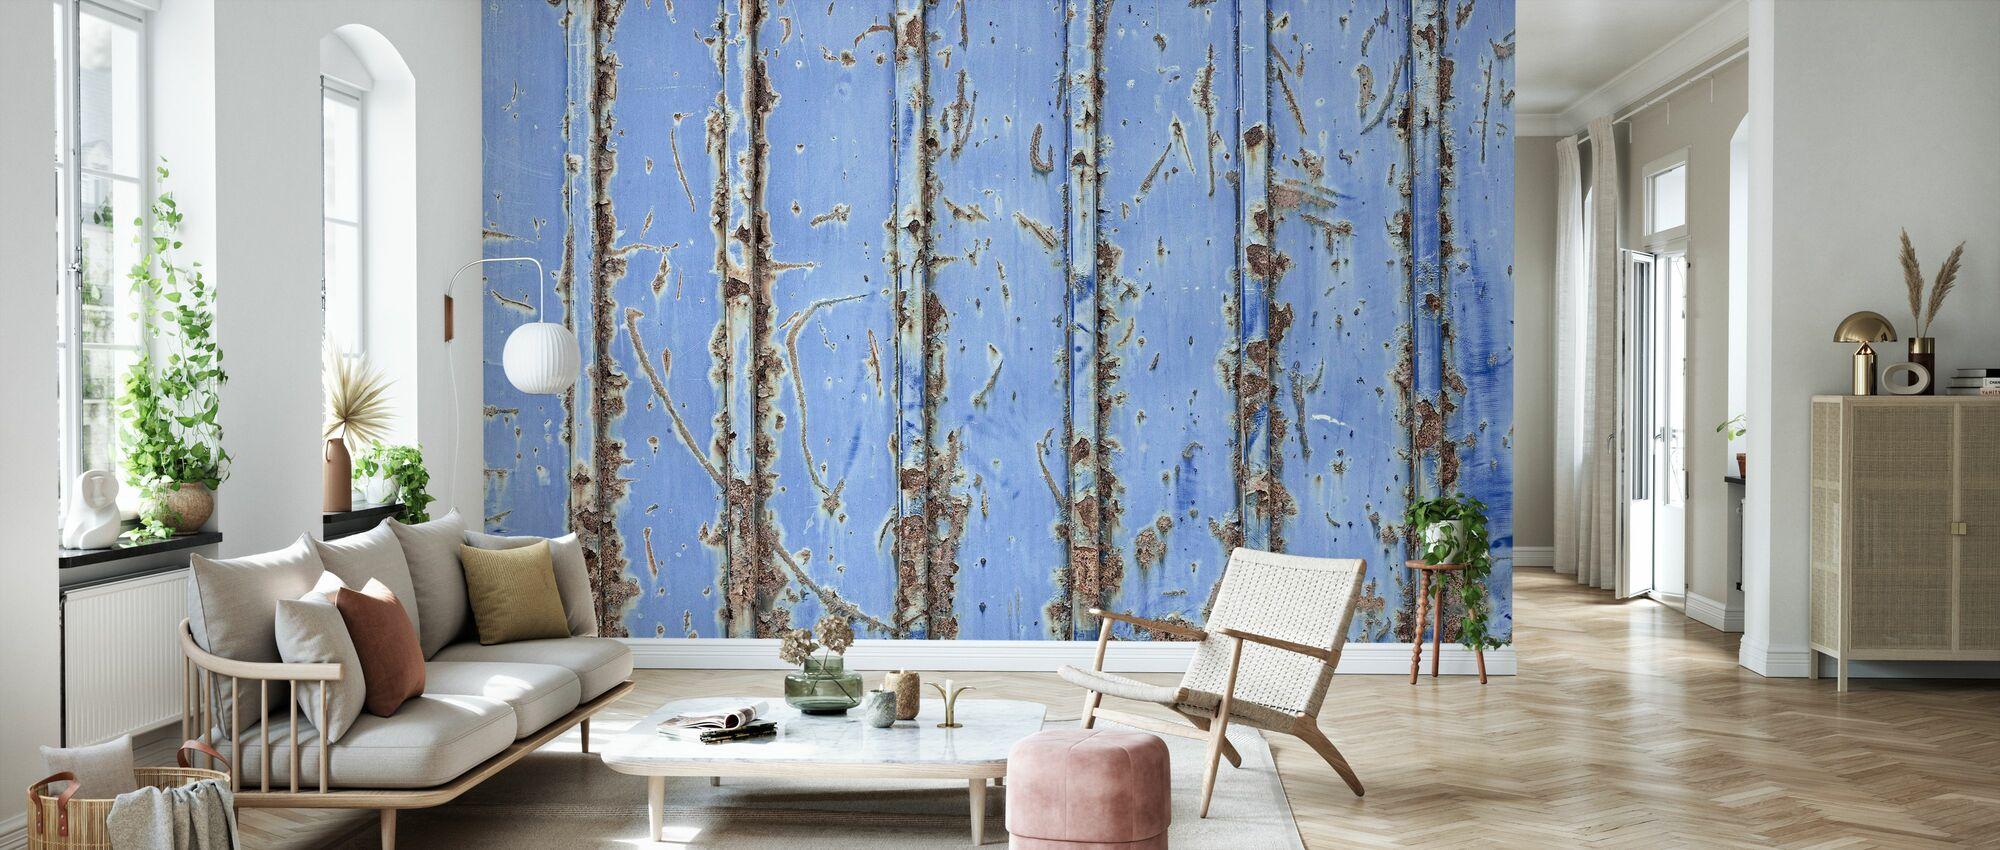 Steel Blue - Wallpaper - Living Room